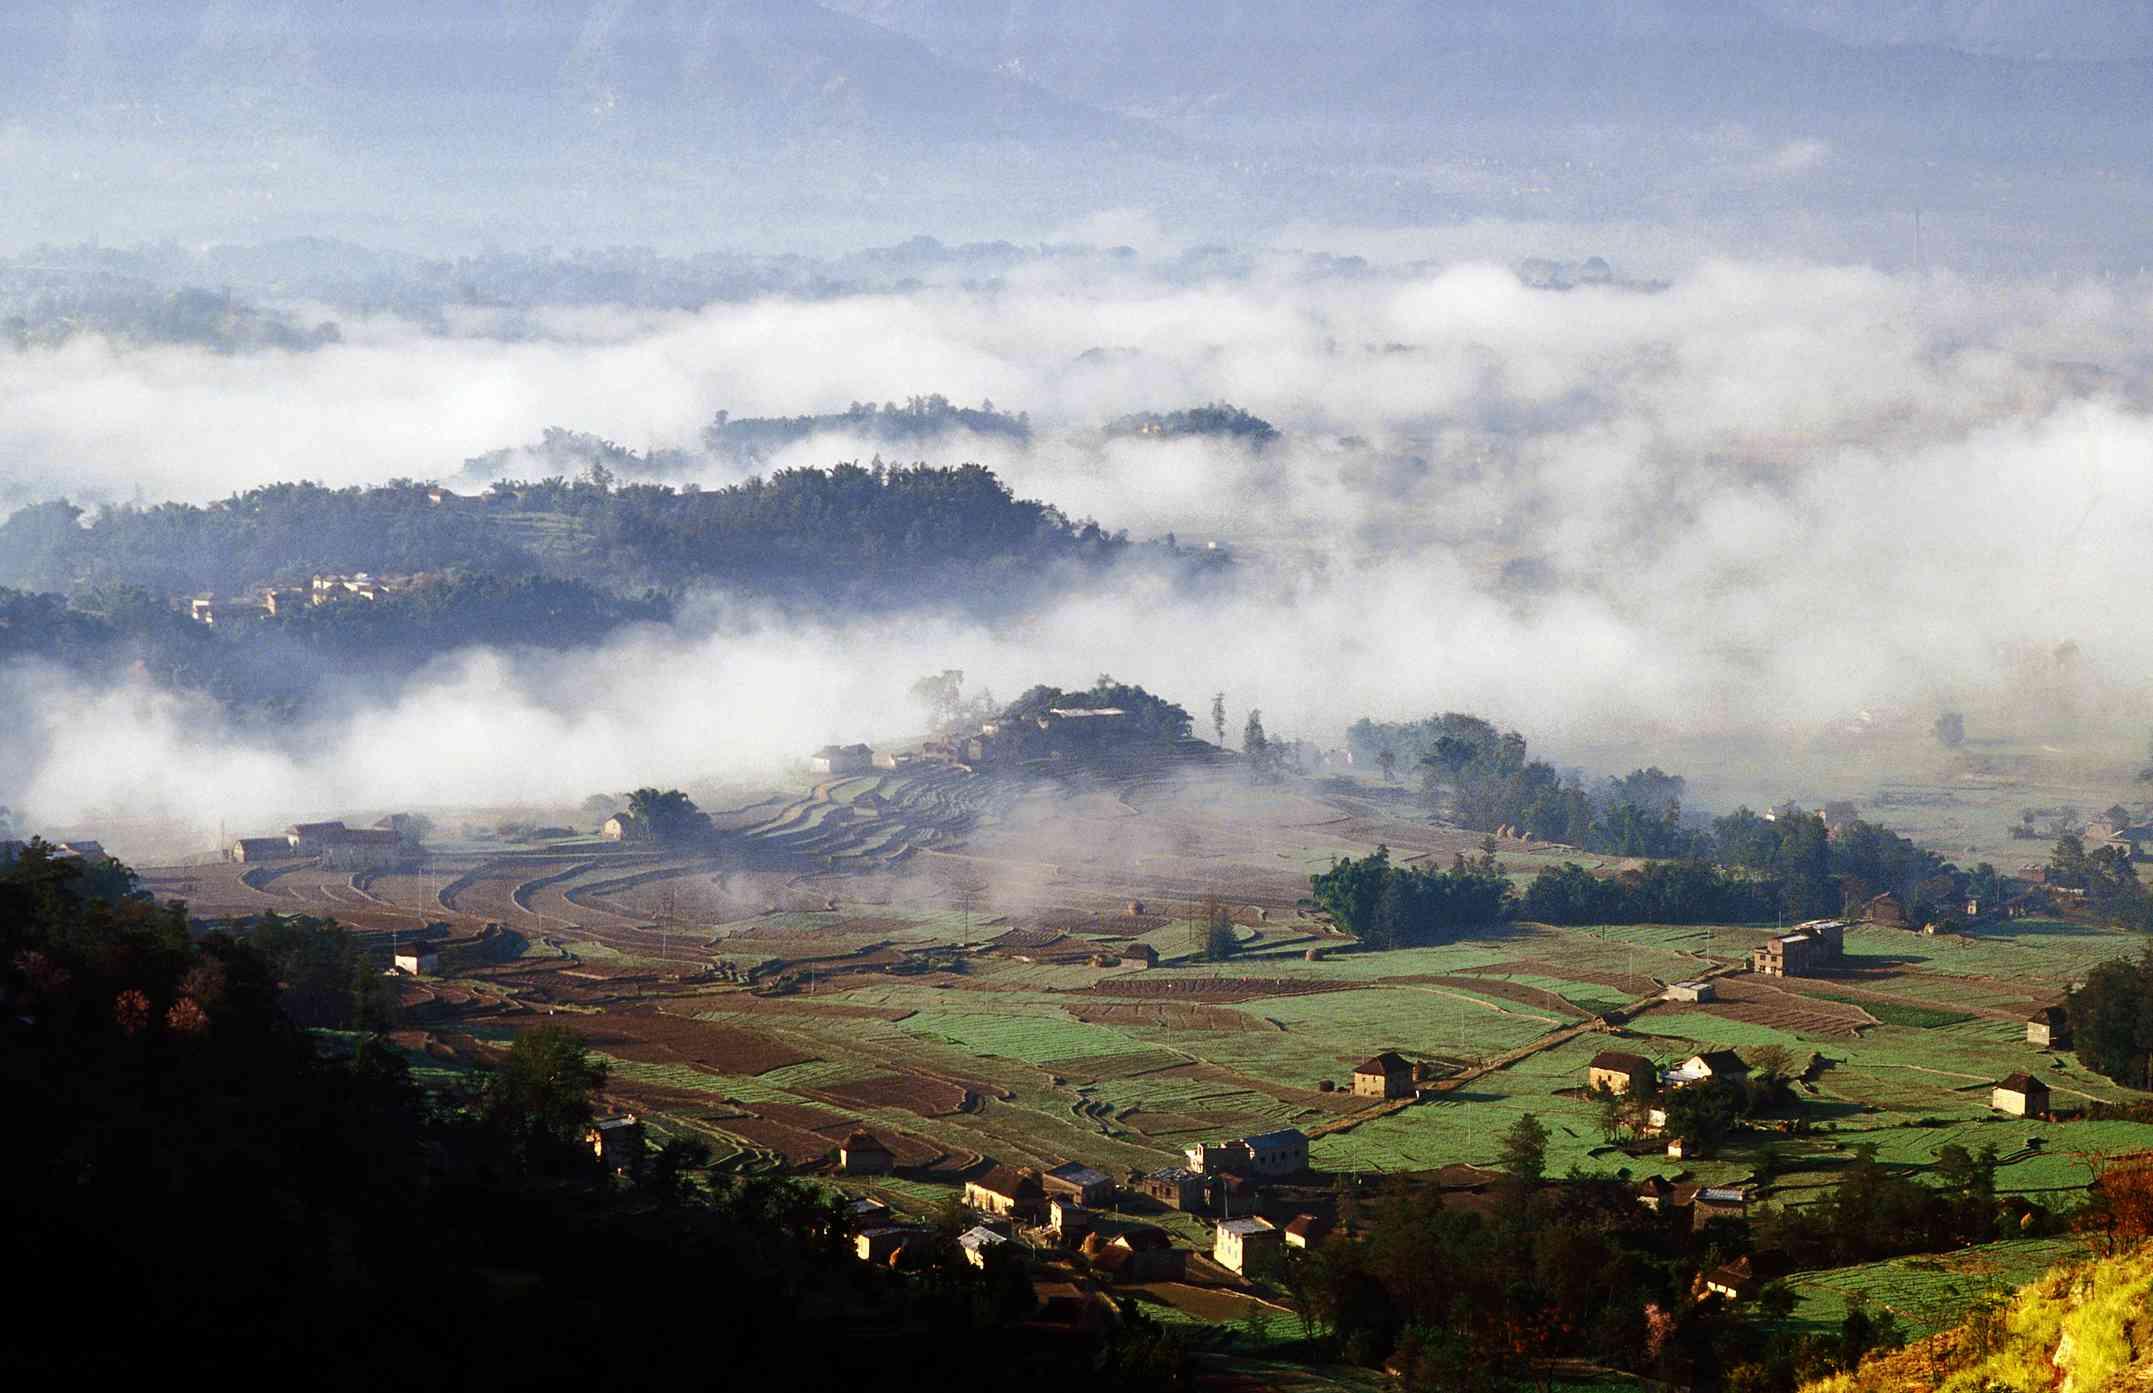 Villages in the Kathmandu Valley.